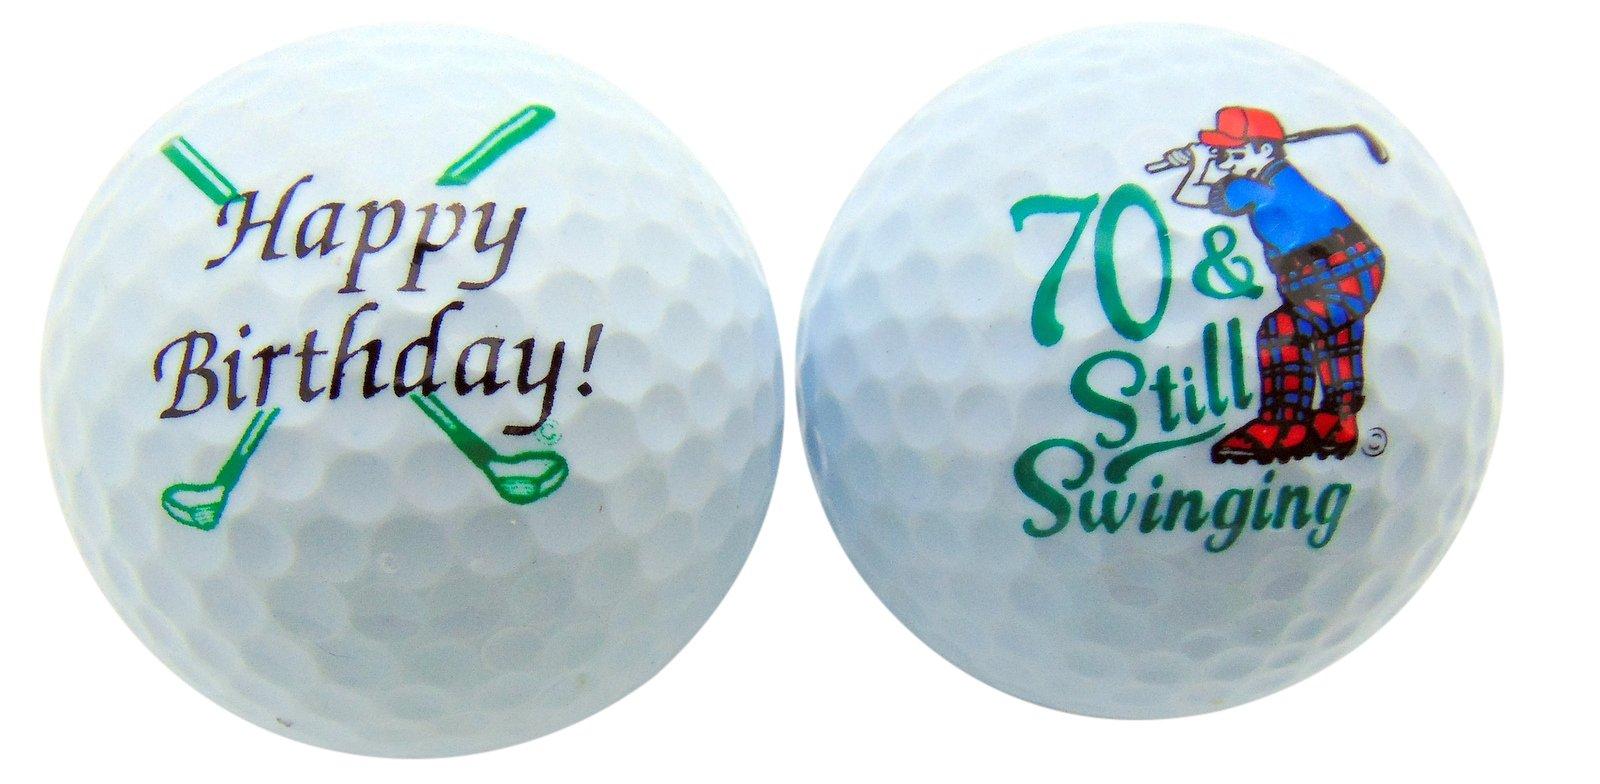 Westman Works 70th Birthday Golf Balls Set of 2 Golf Ball Golfer Gift Pack by Westman Works